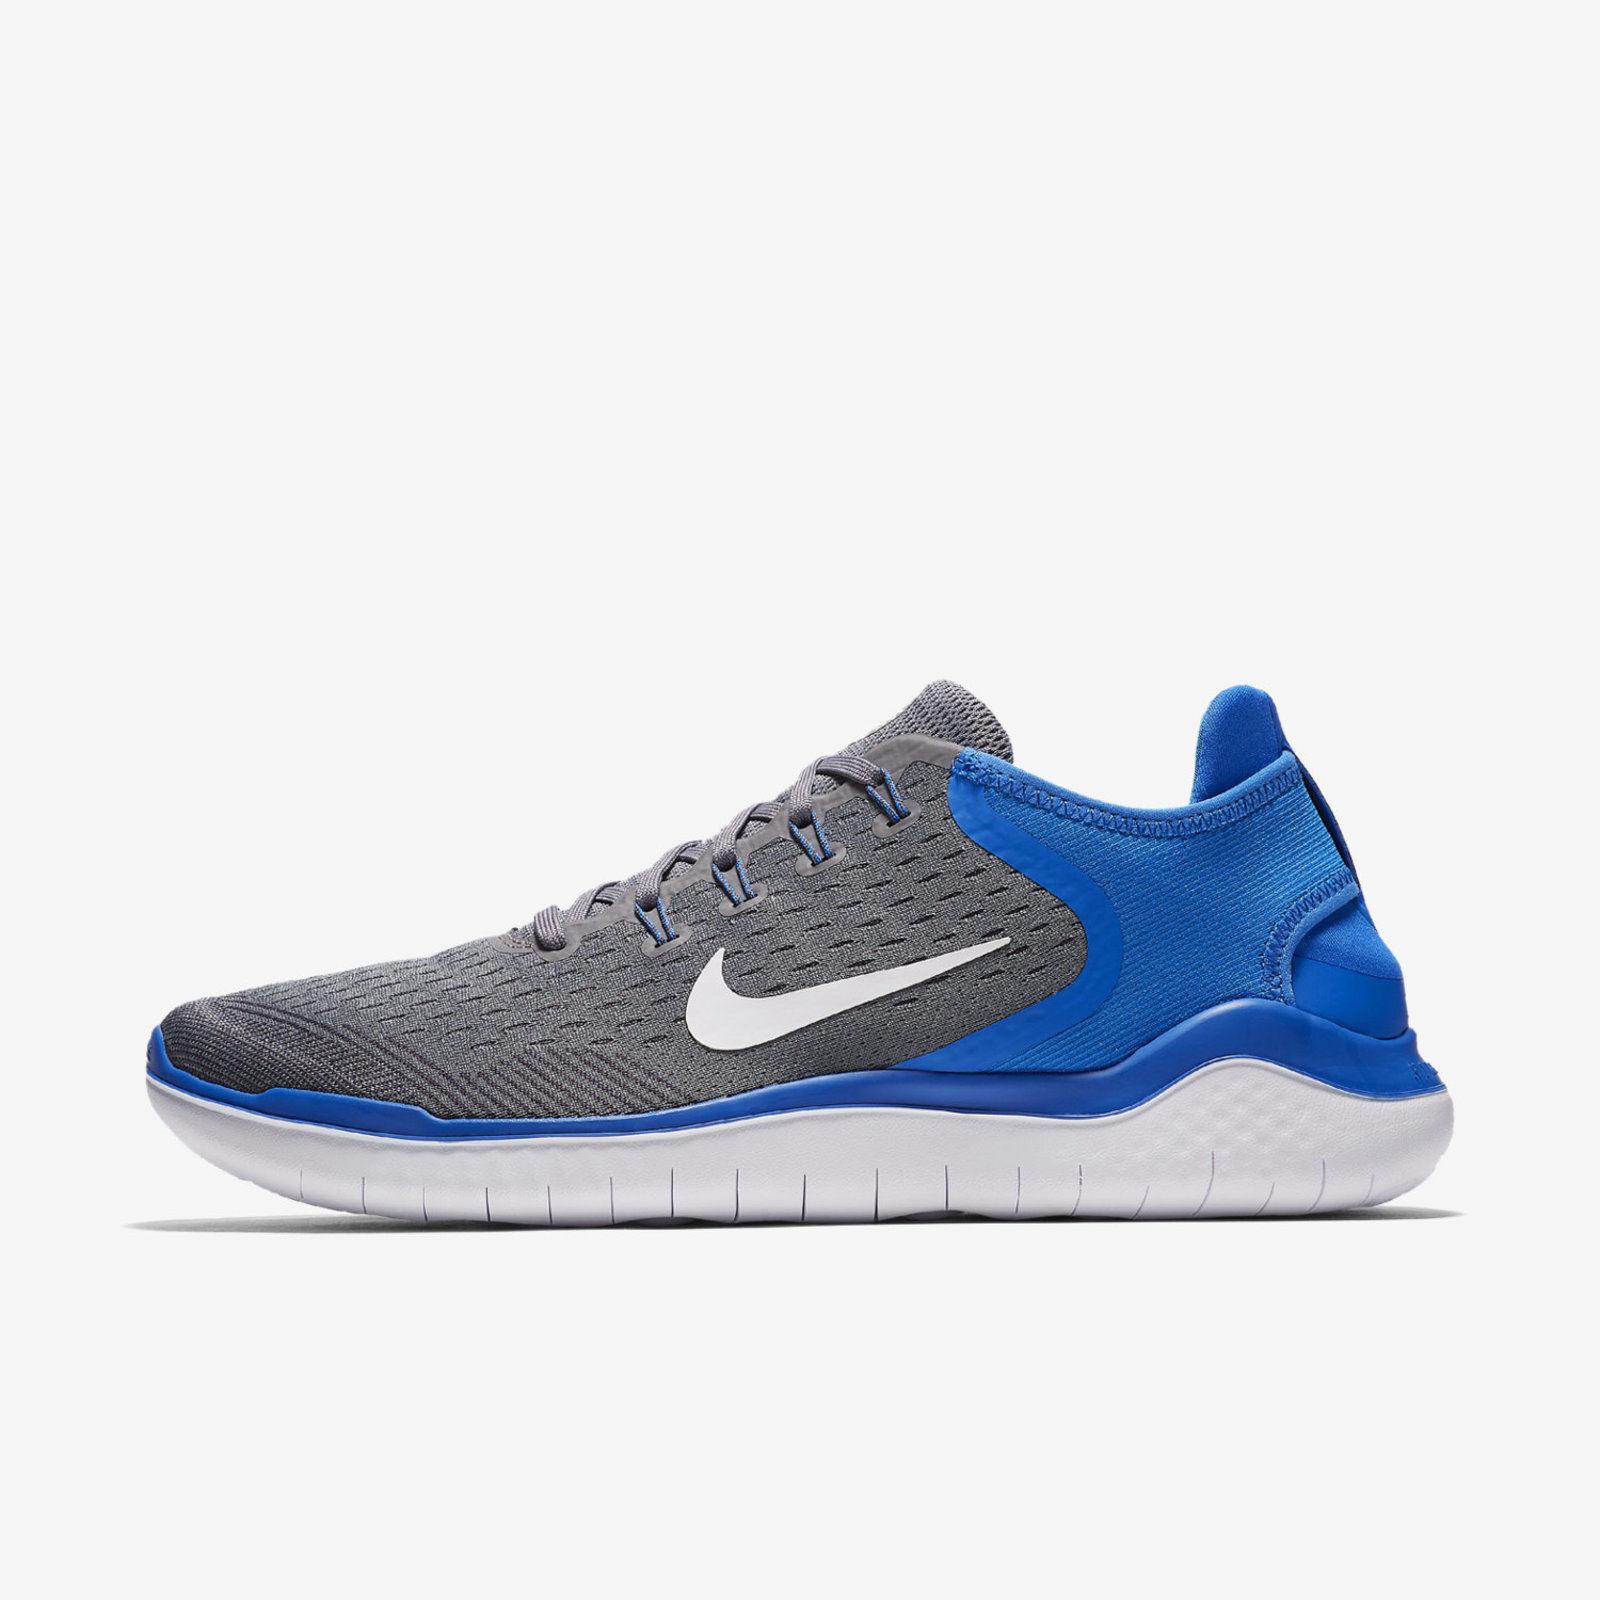 NIB Nike Nike Nike Free RN Run 2018 Sneakers Gunsmoke bluee Wht 942836-008 MEN'S 9.5-11.5 2bae3e